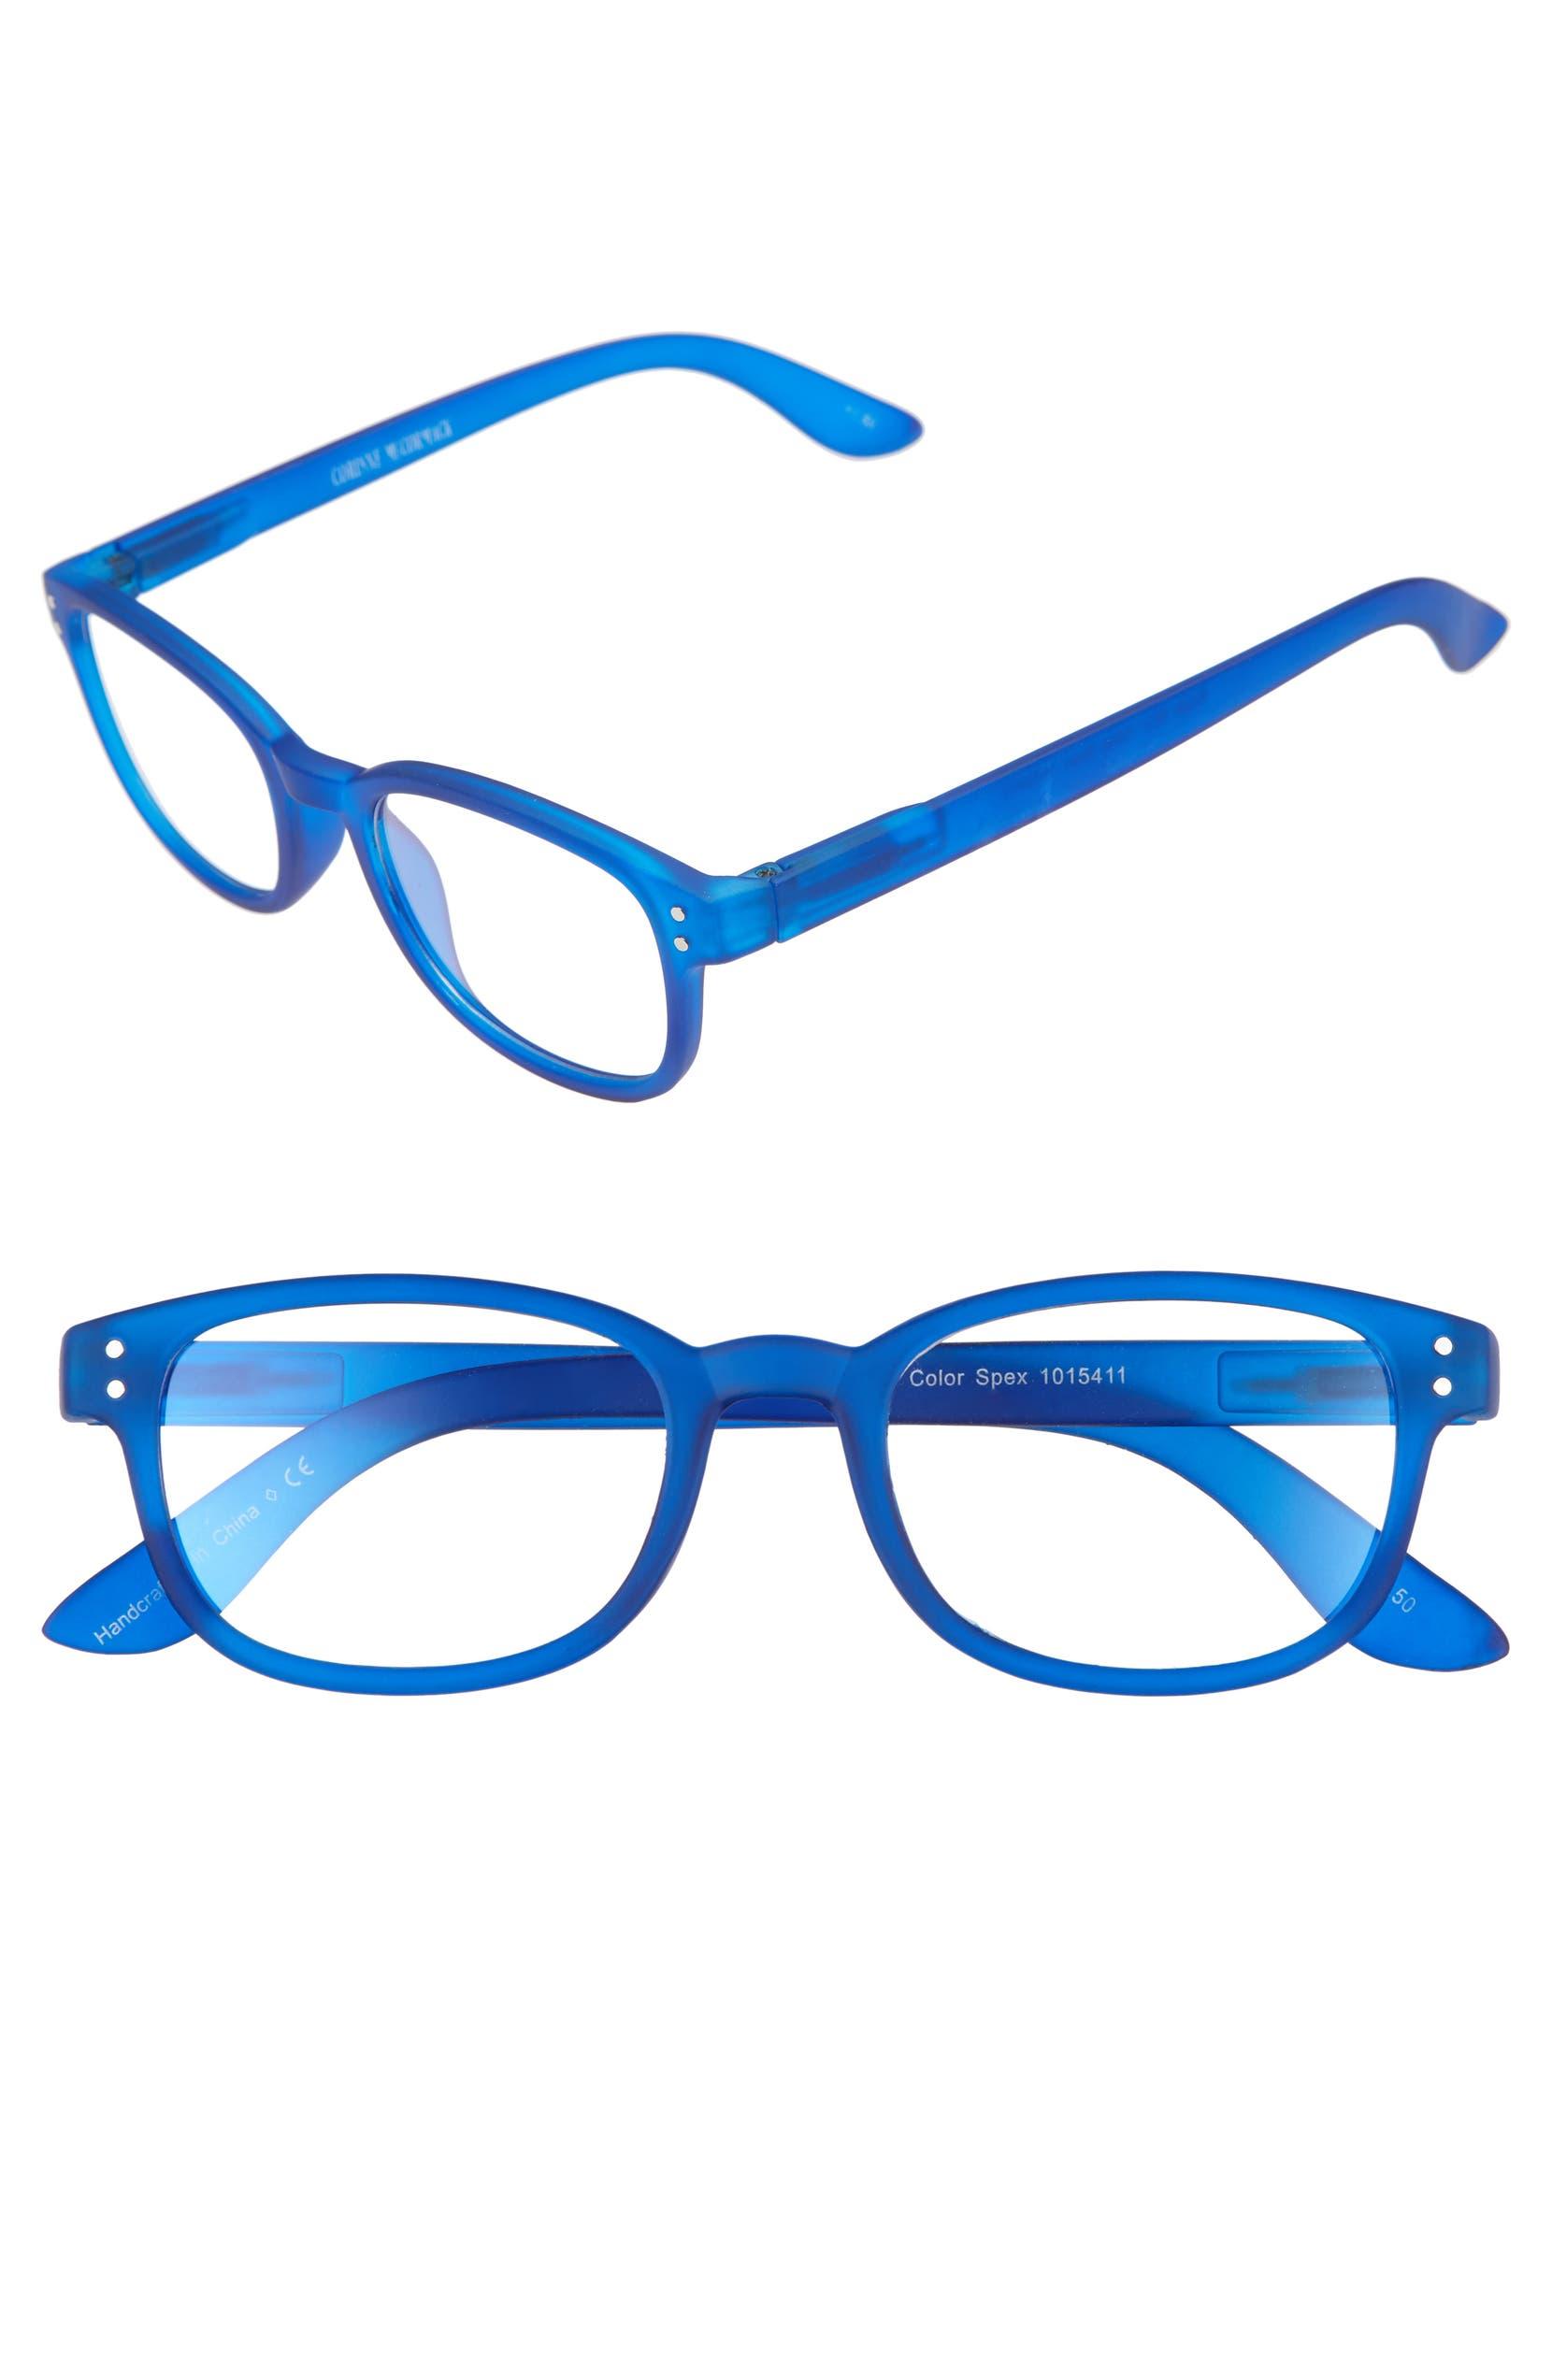 0e235b69b54c Corinne McCormack ColorSpex® 50mm Blue Light Blocking Reading Glasses